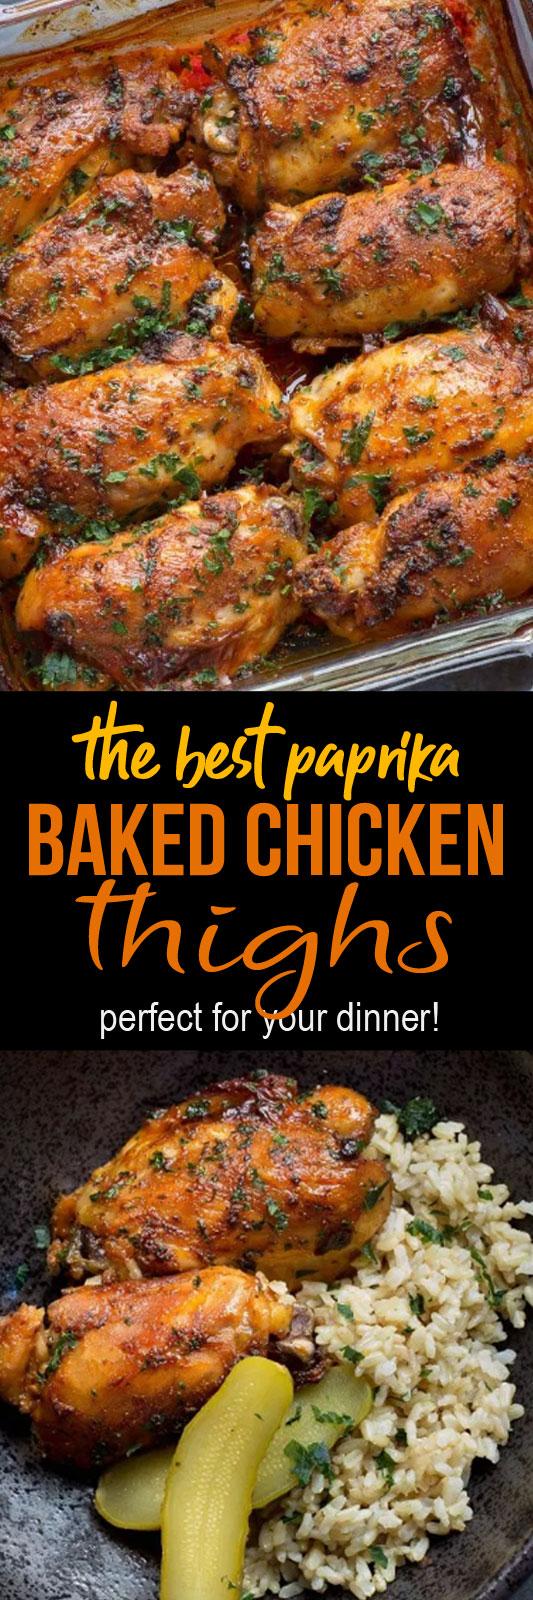 Paprika Baked Chicken Thighs #chicken #dinner #lunch